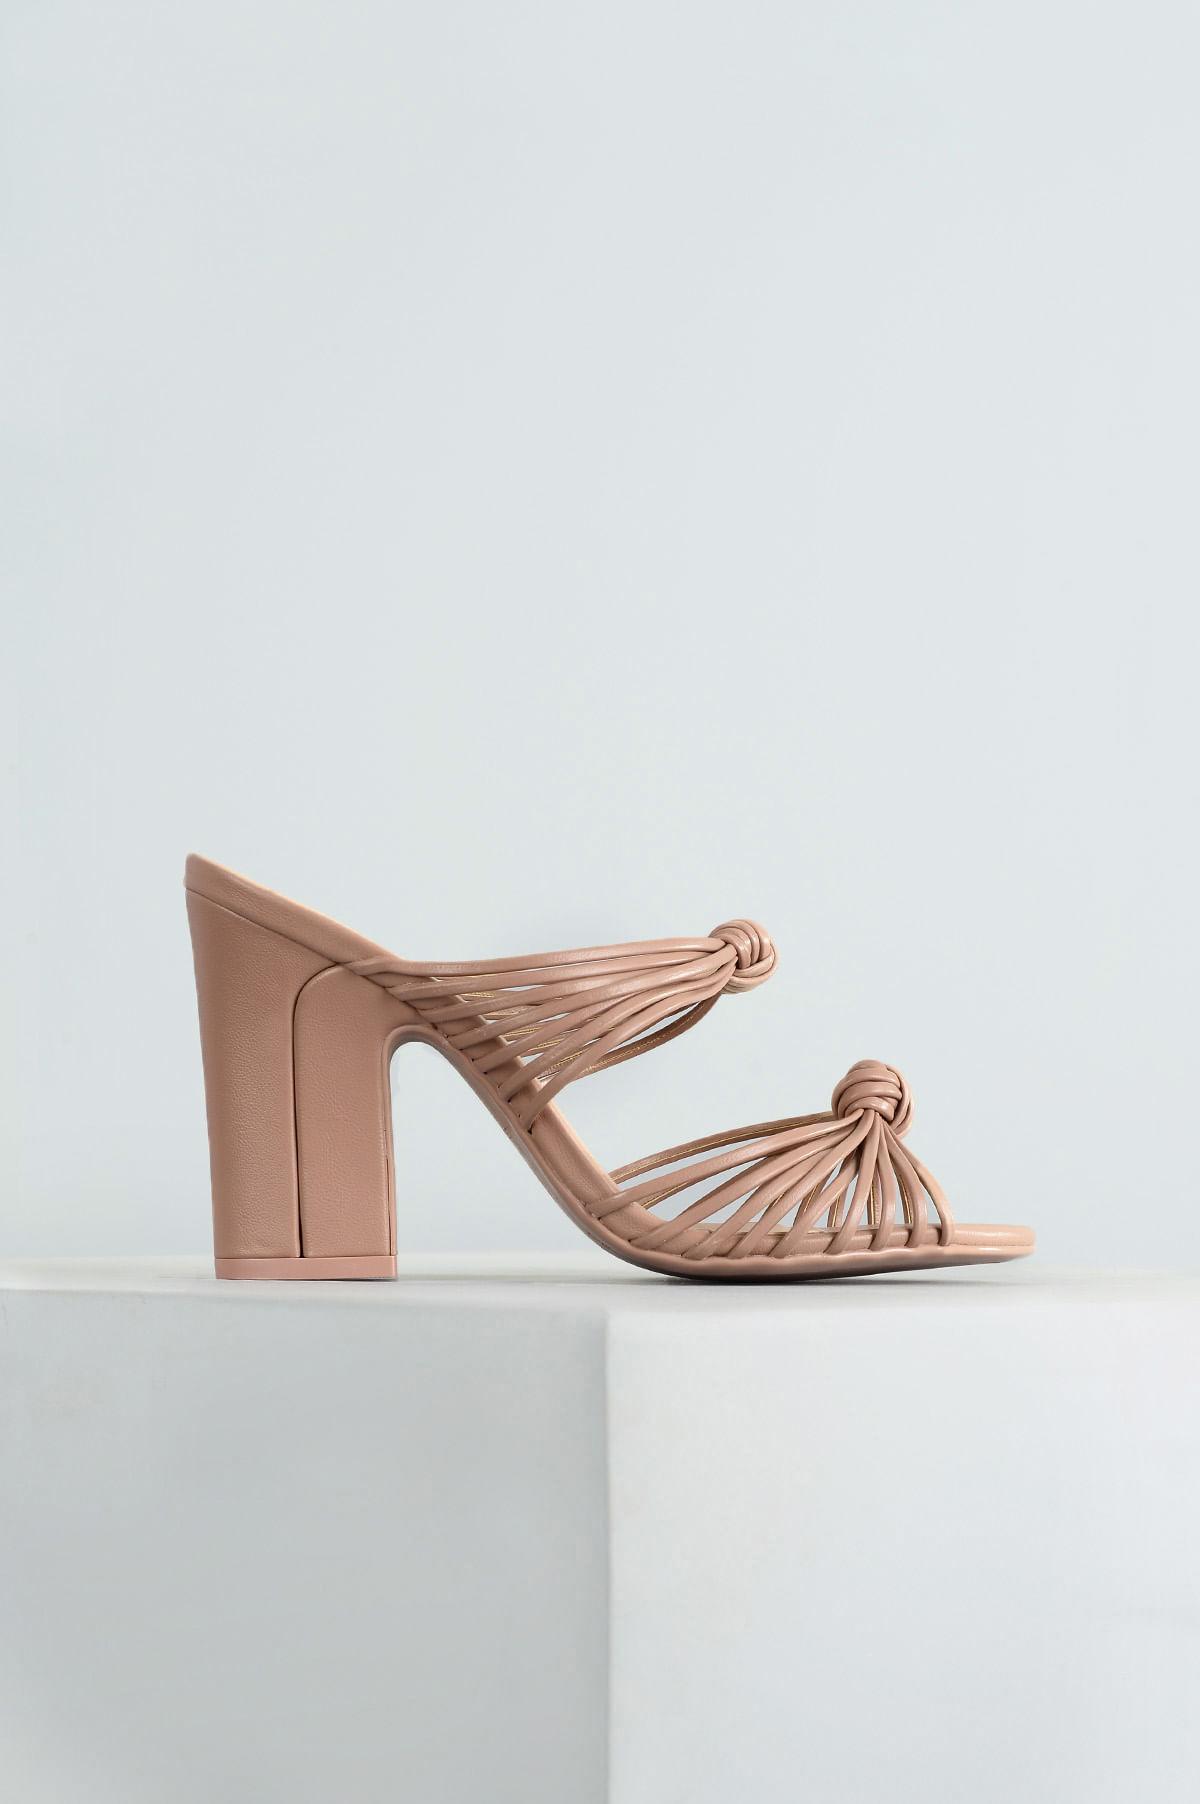 c788bf6416 Tamanco Feminino Salto Alto Benet Mundial SINT - NUDE - Mundial Calçados